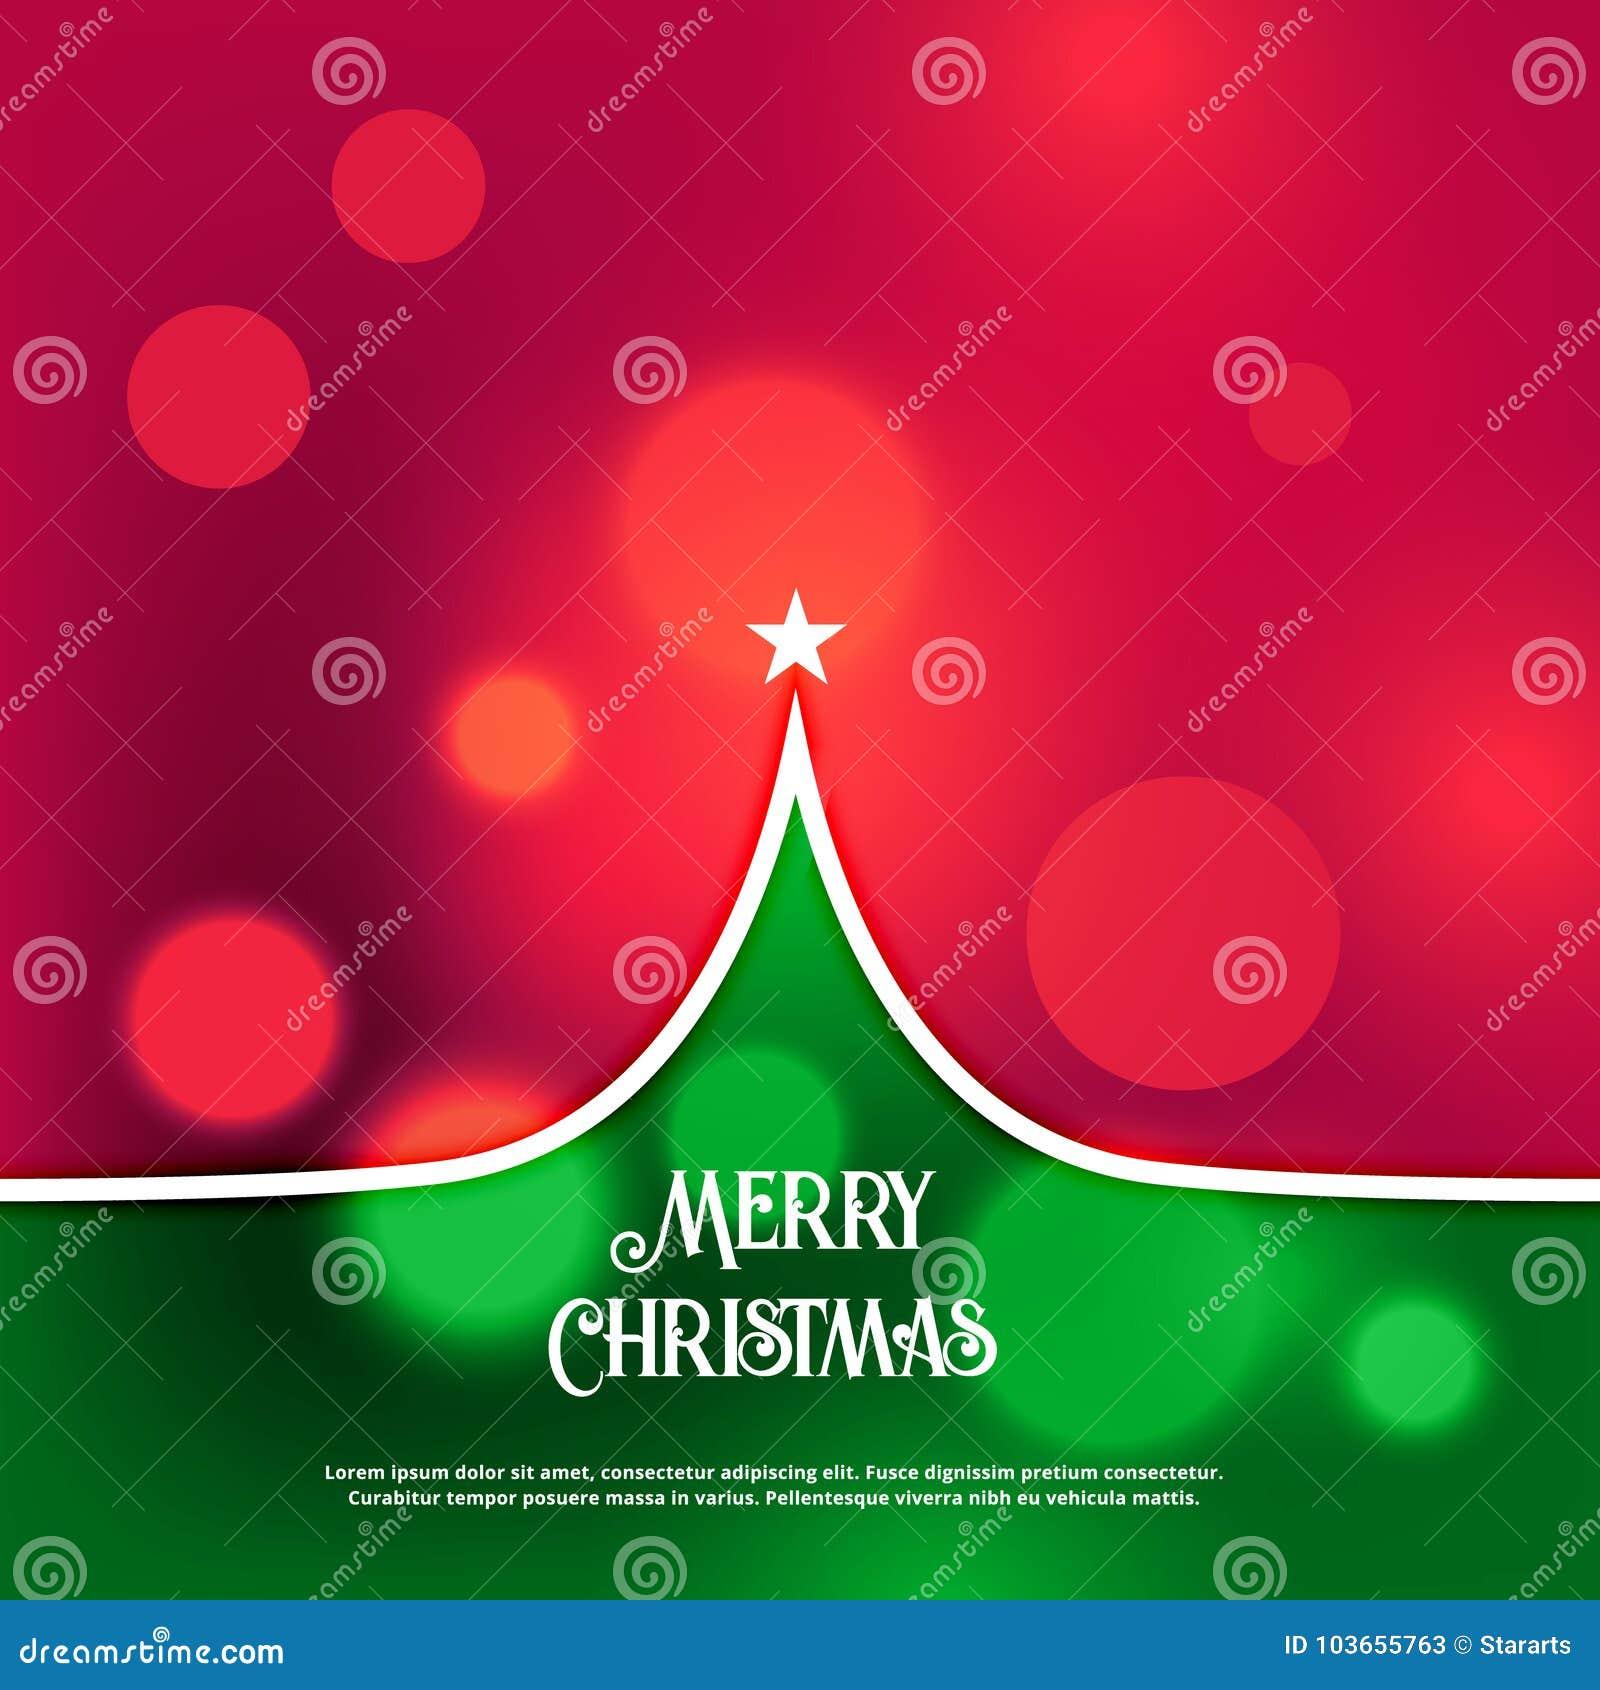 Awesome Creative Christmas Tree Design Greeting Stock